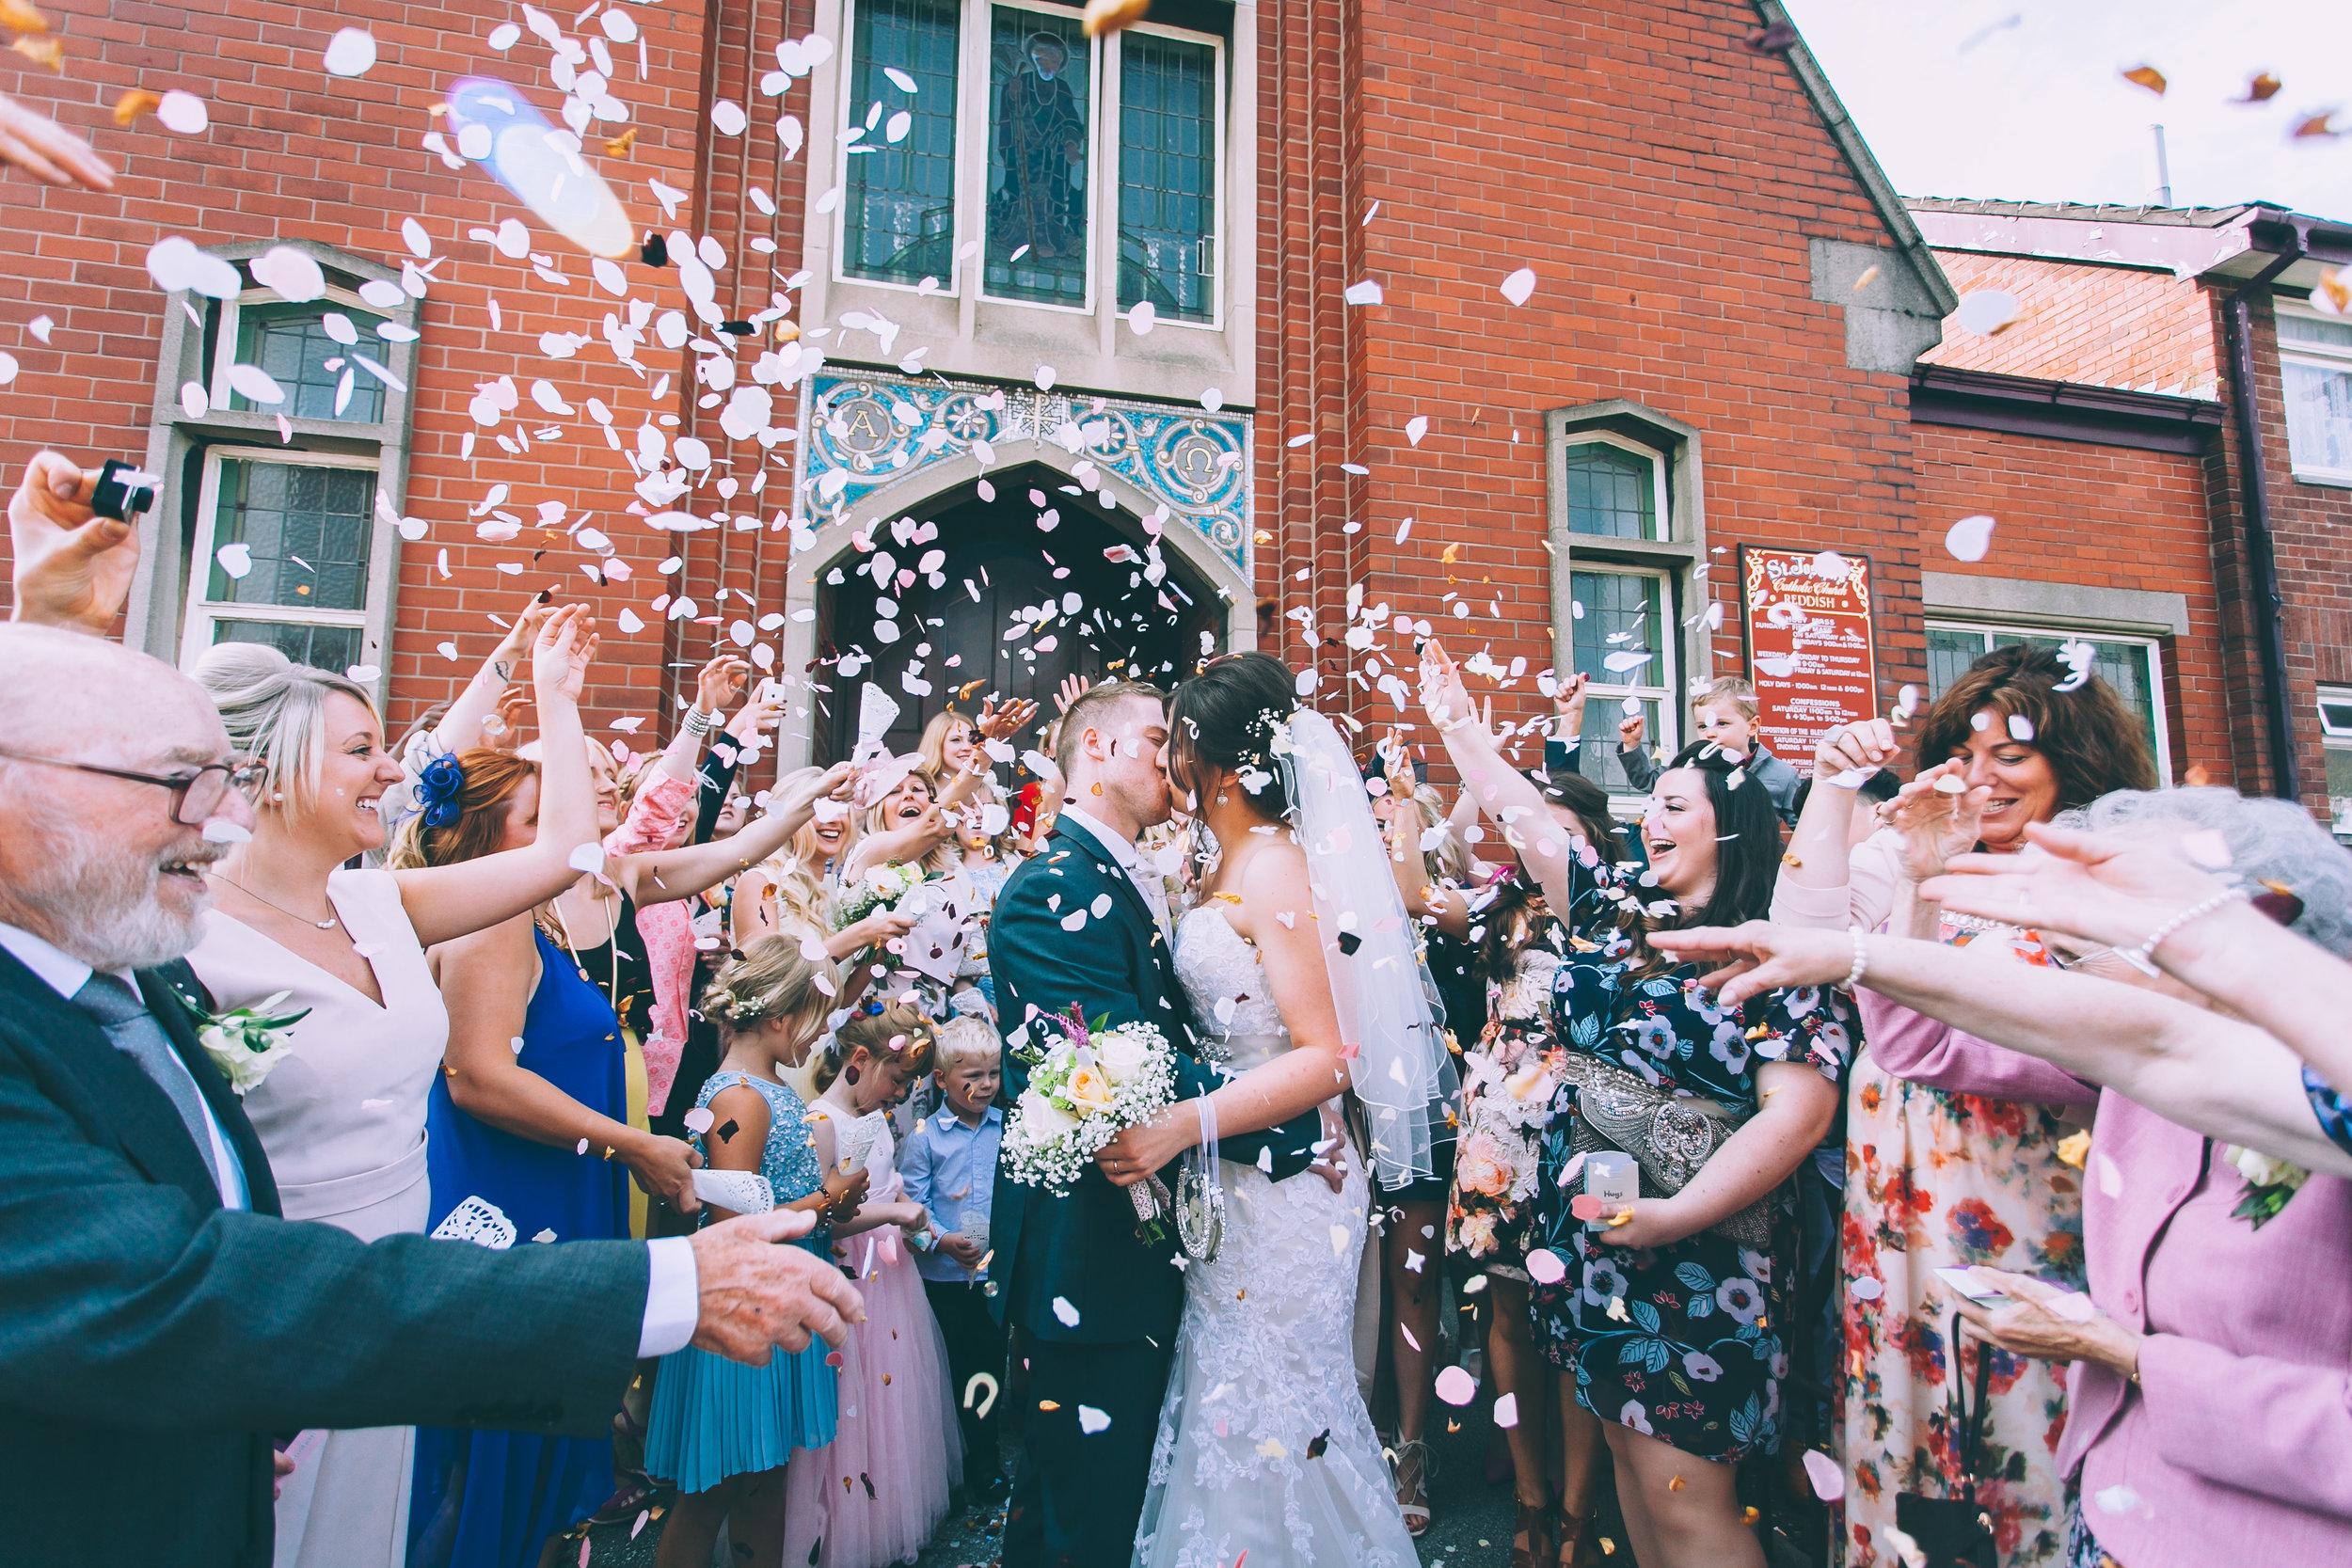 rebecca&dan_wedding_22.08.15_tombiddle_tb233.jpg